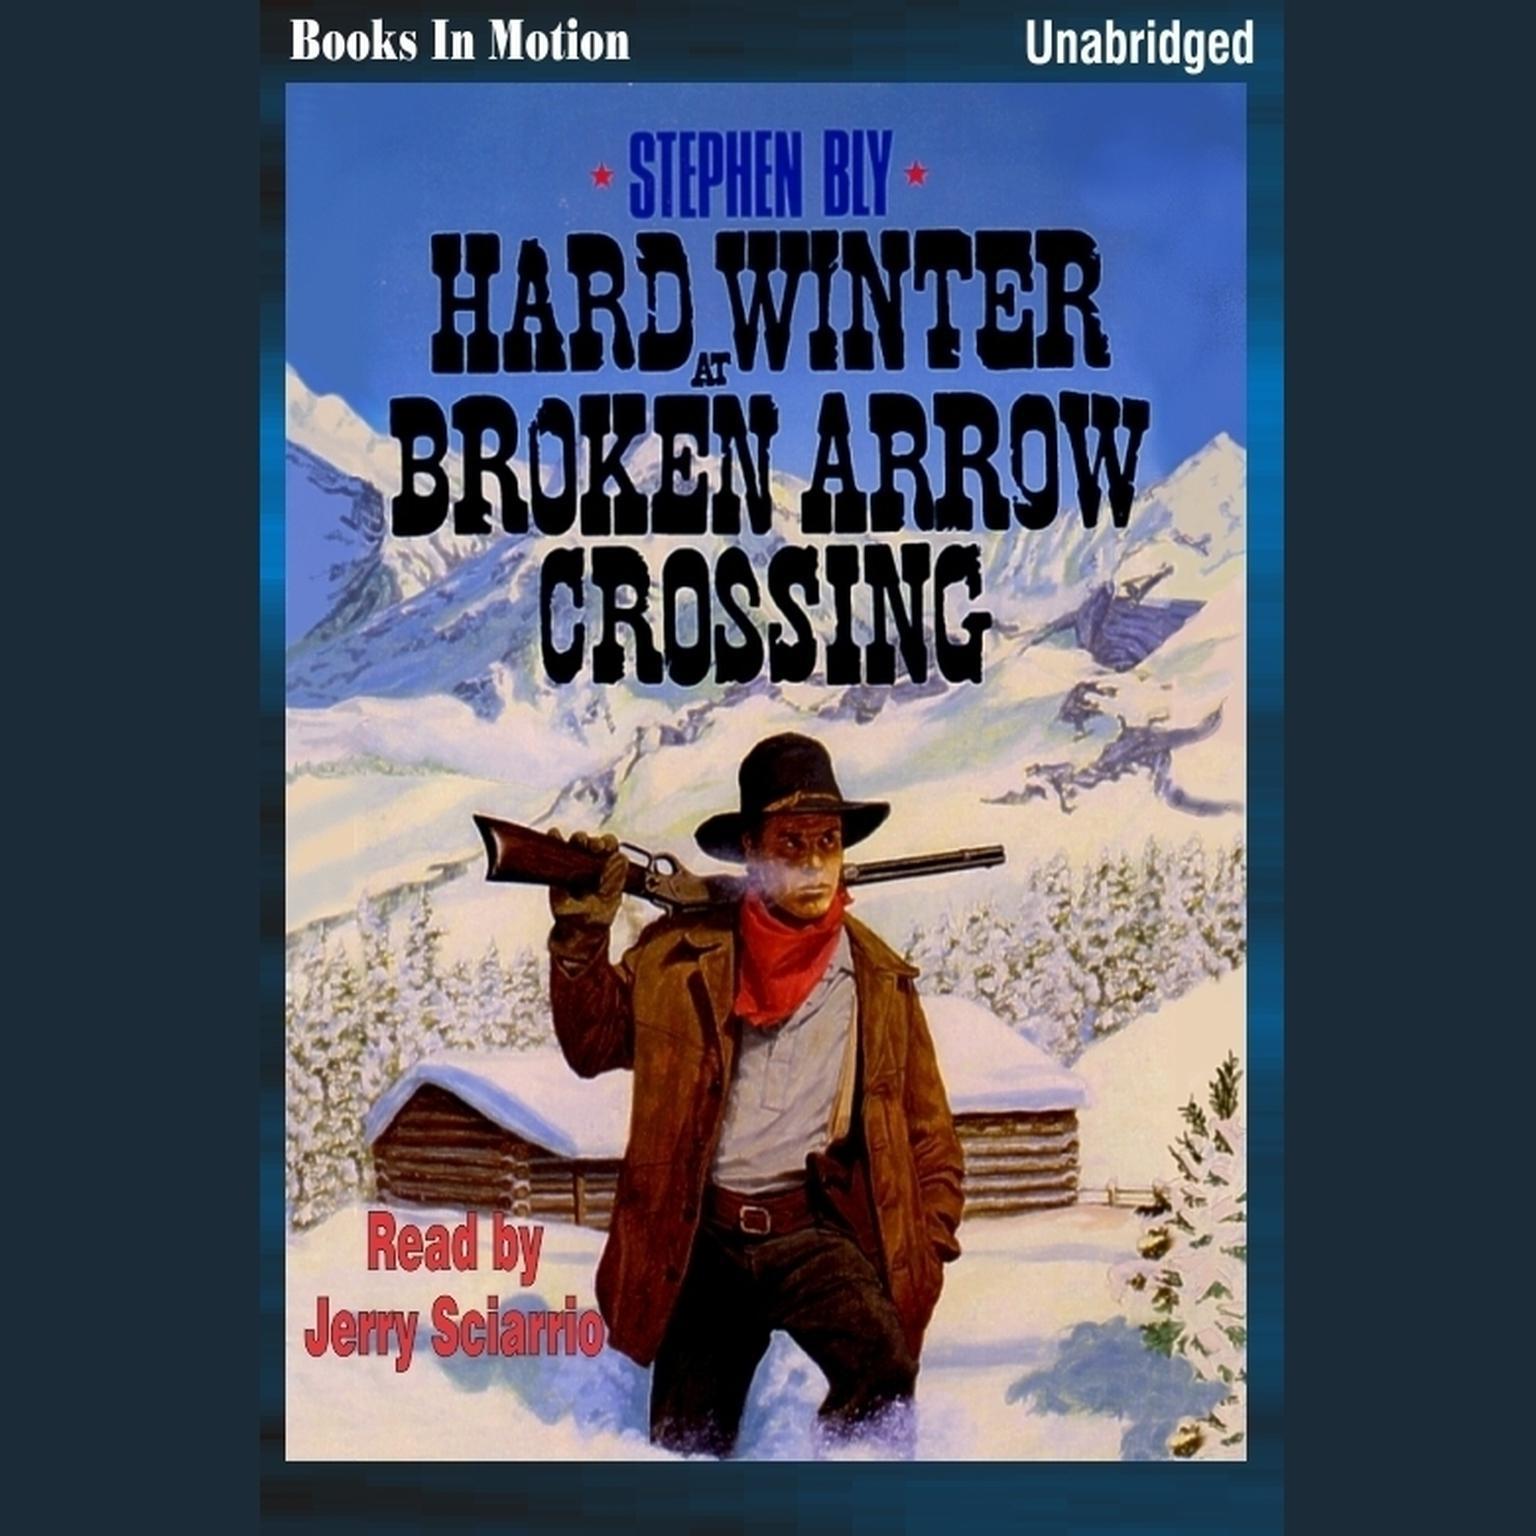 Hard Winter at Broken Arrow Crossing Audiobook, by Stephen Bly